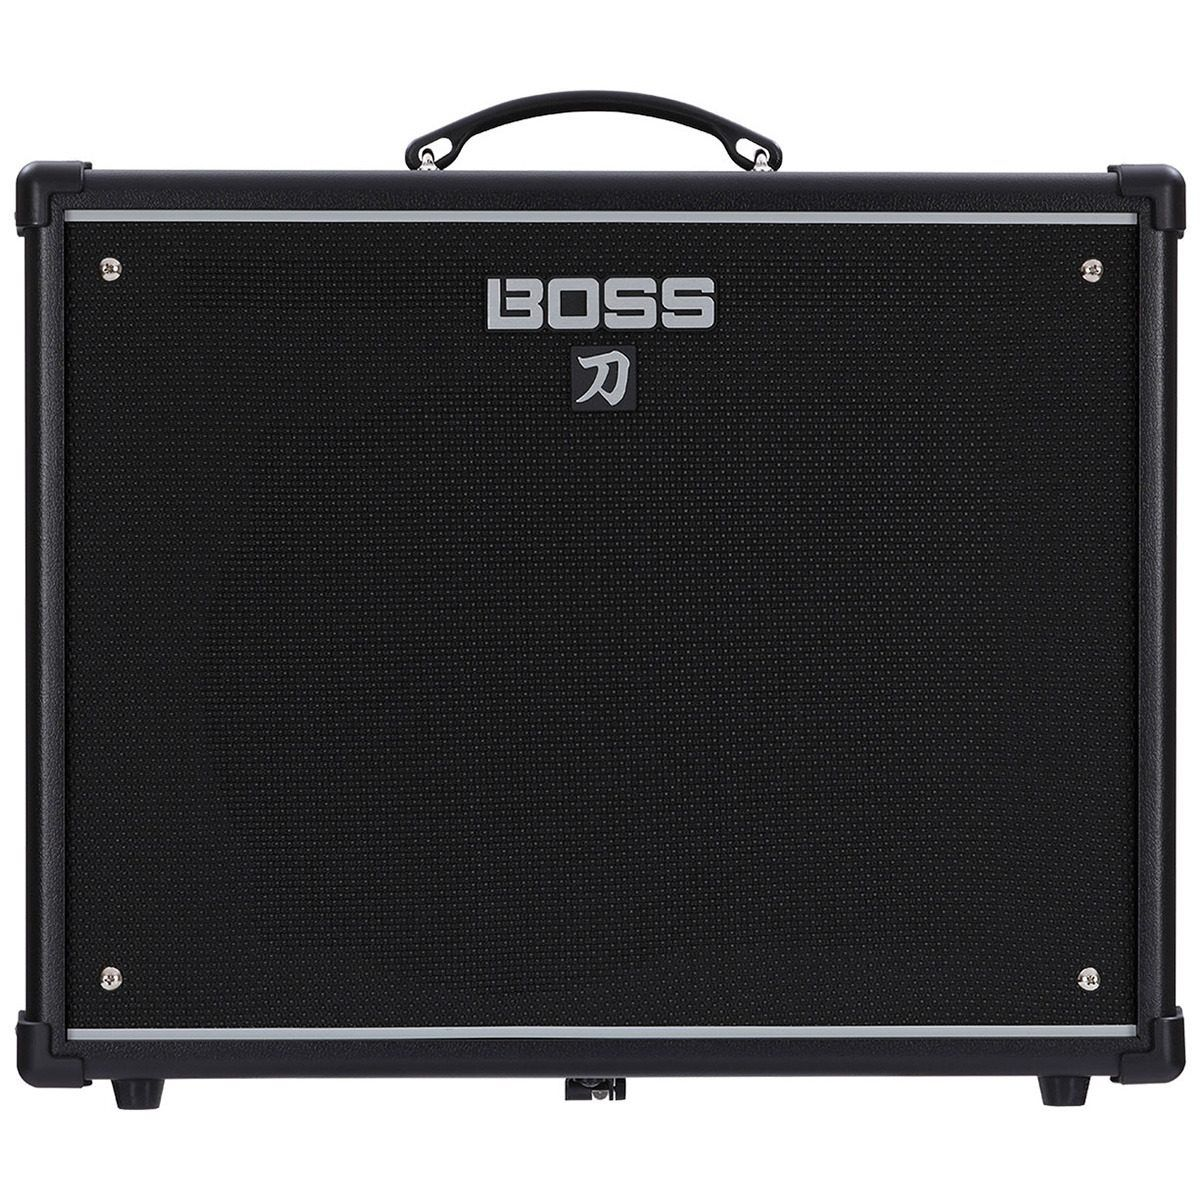 Katan 100 Boss Amplificador P/ Guitarra 100 Watts